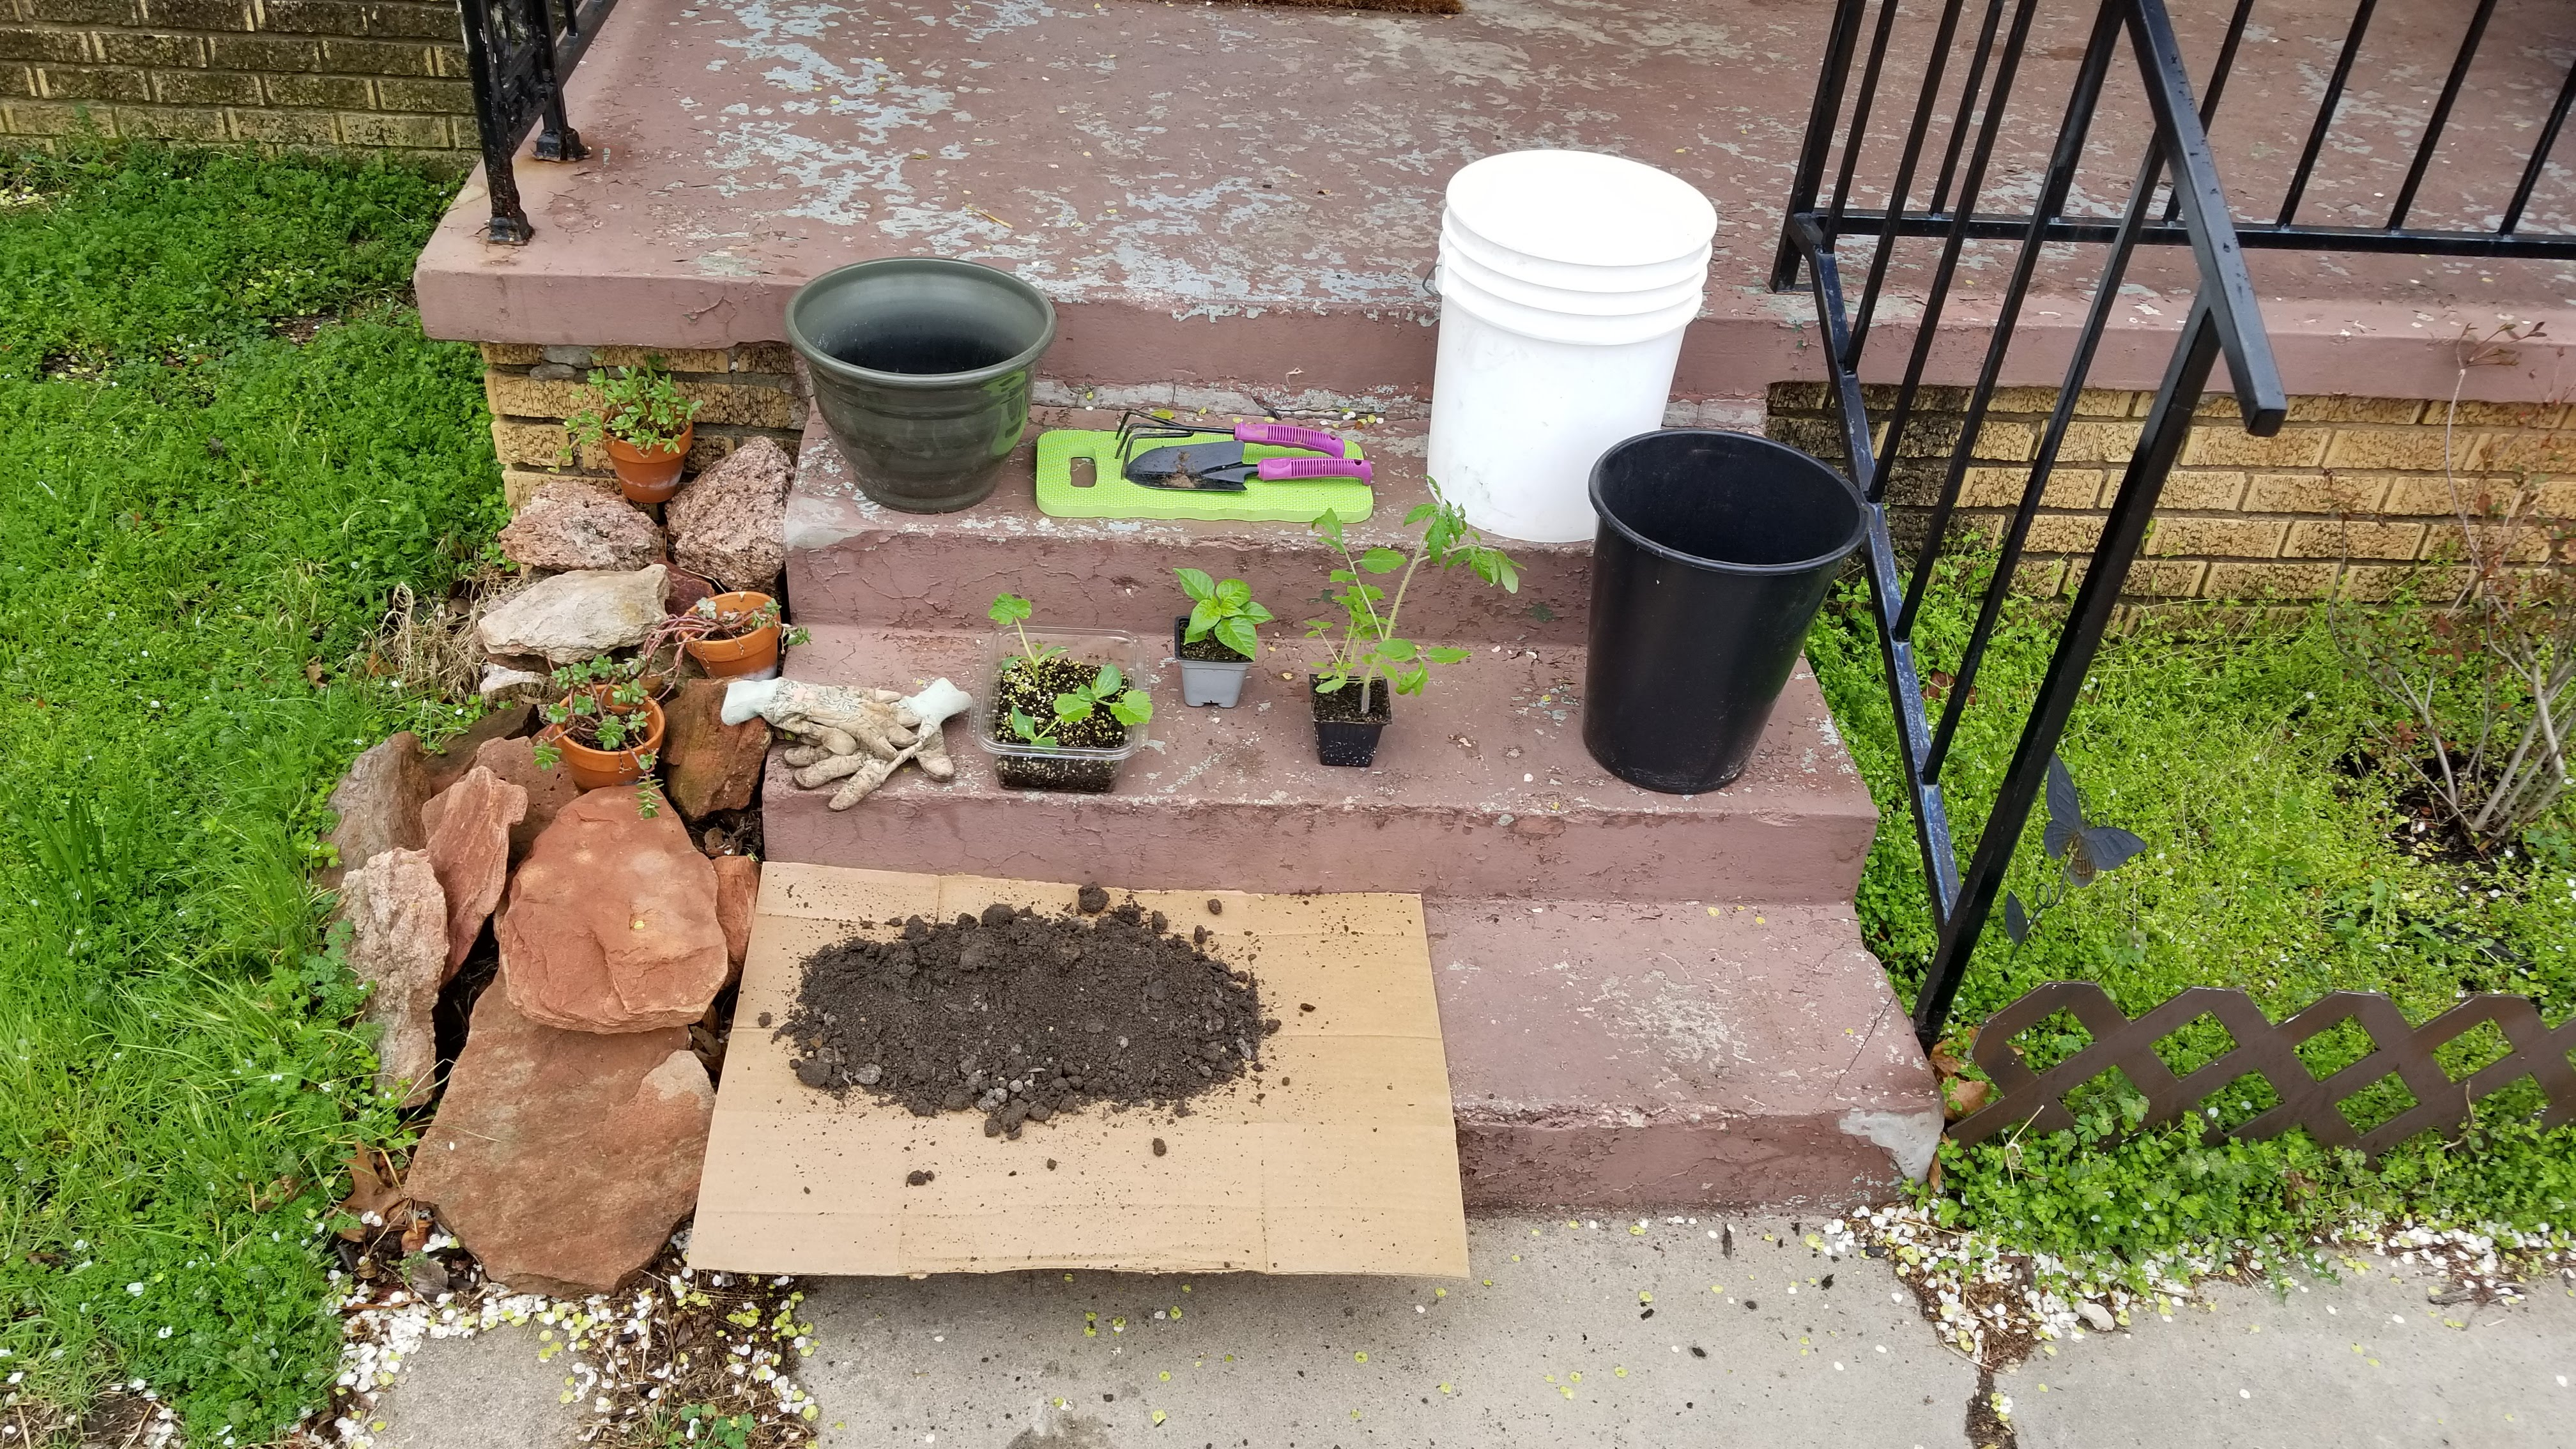 Gardening materials